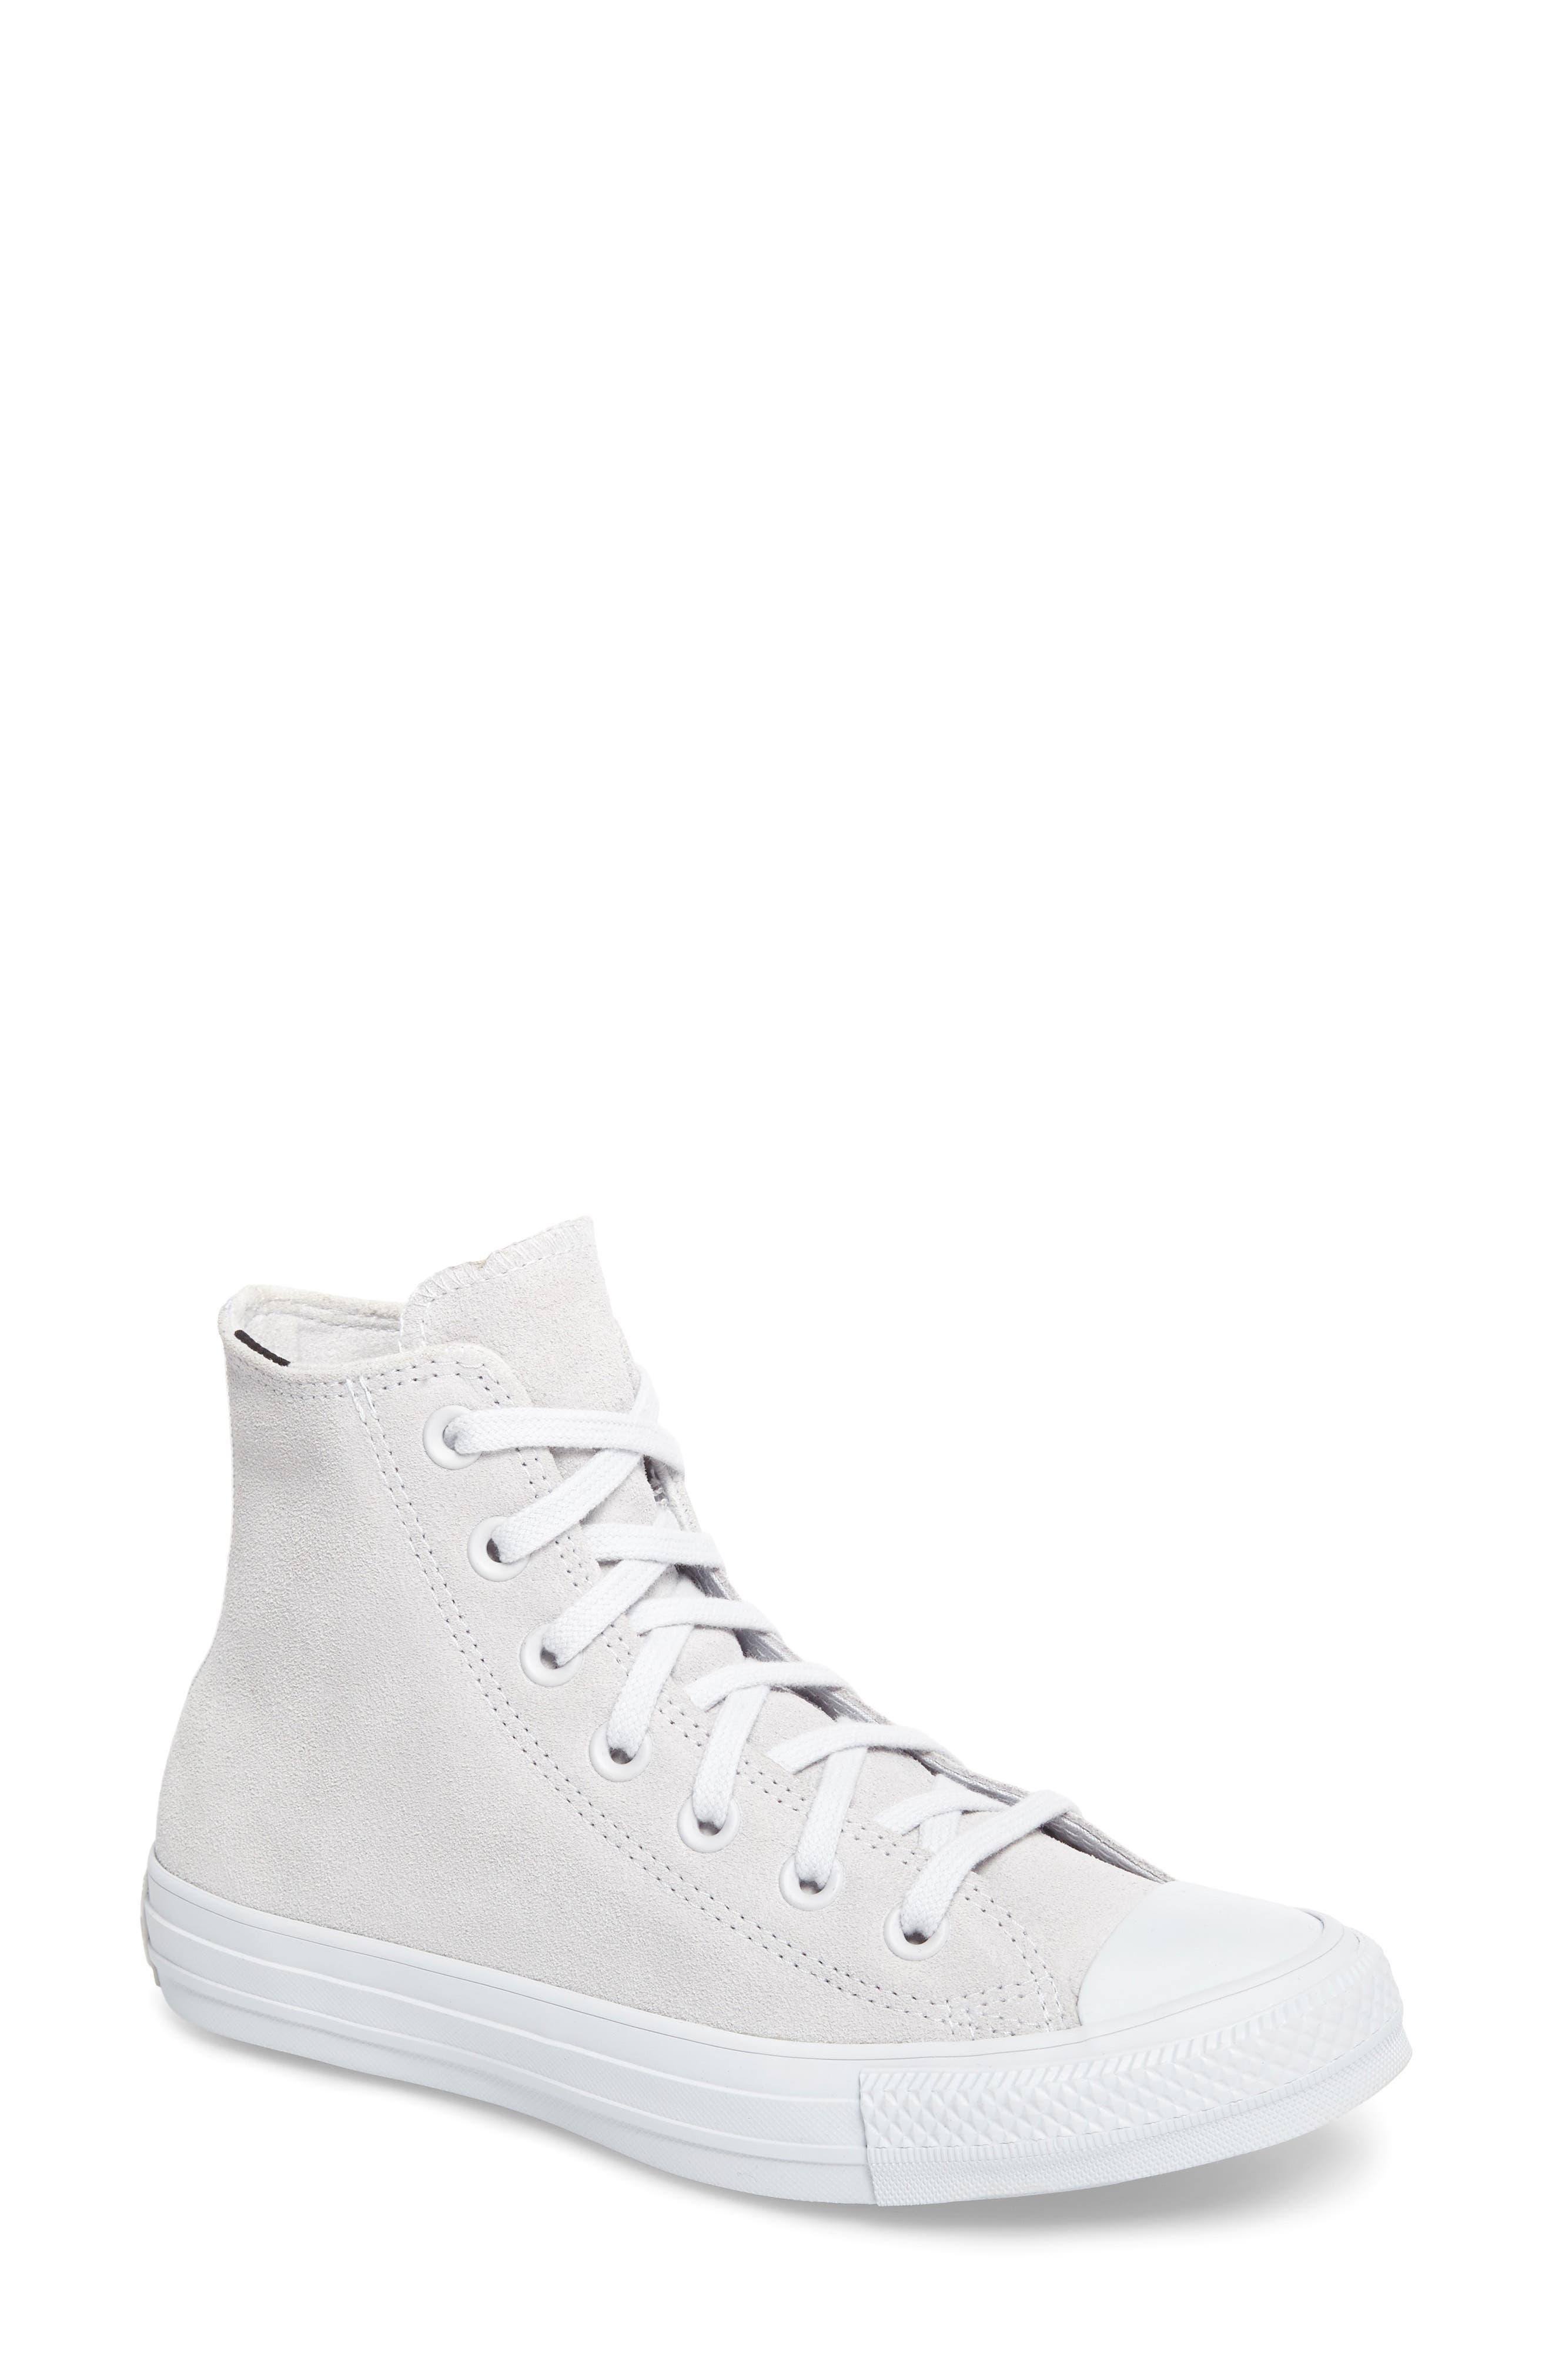 Converse Chuck Taylor® All Star® Seasonal Hi Sneaker (Women)